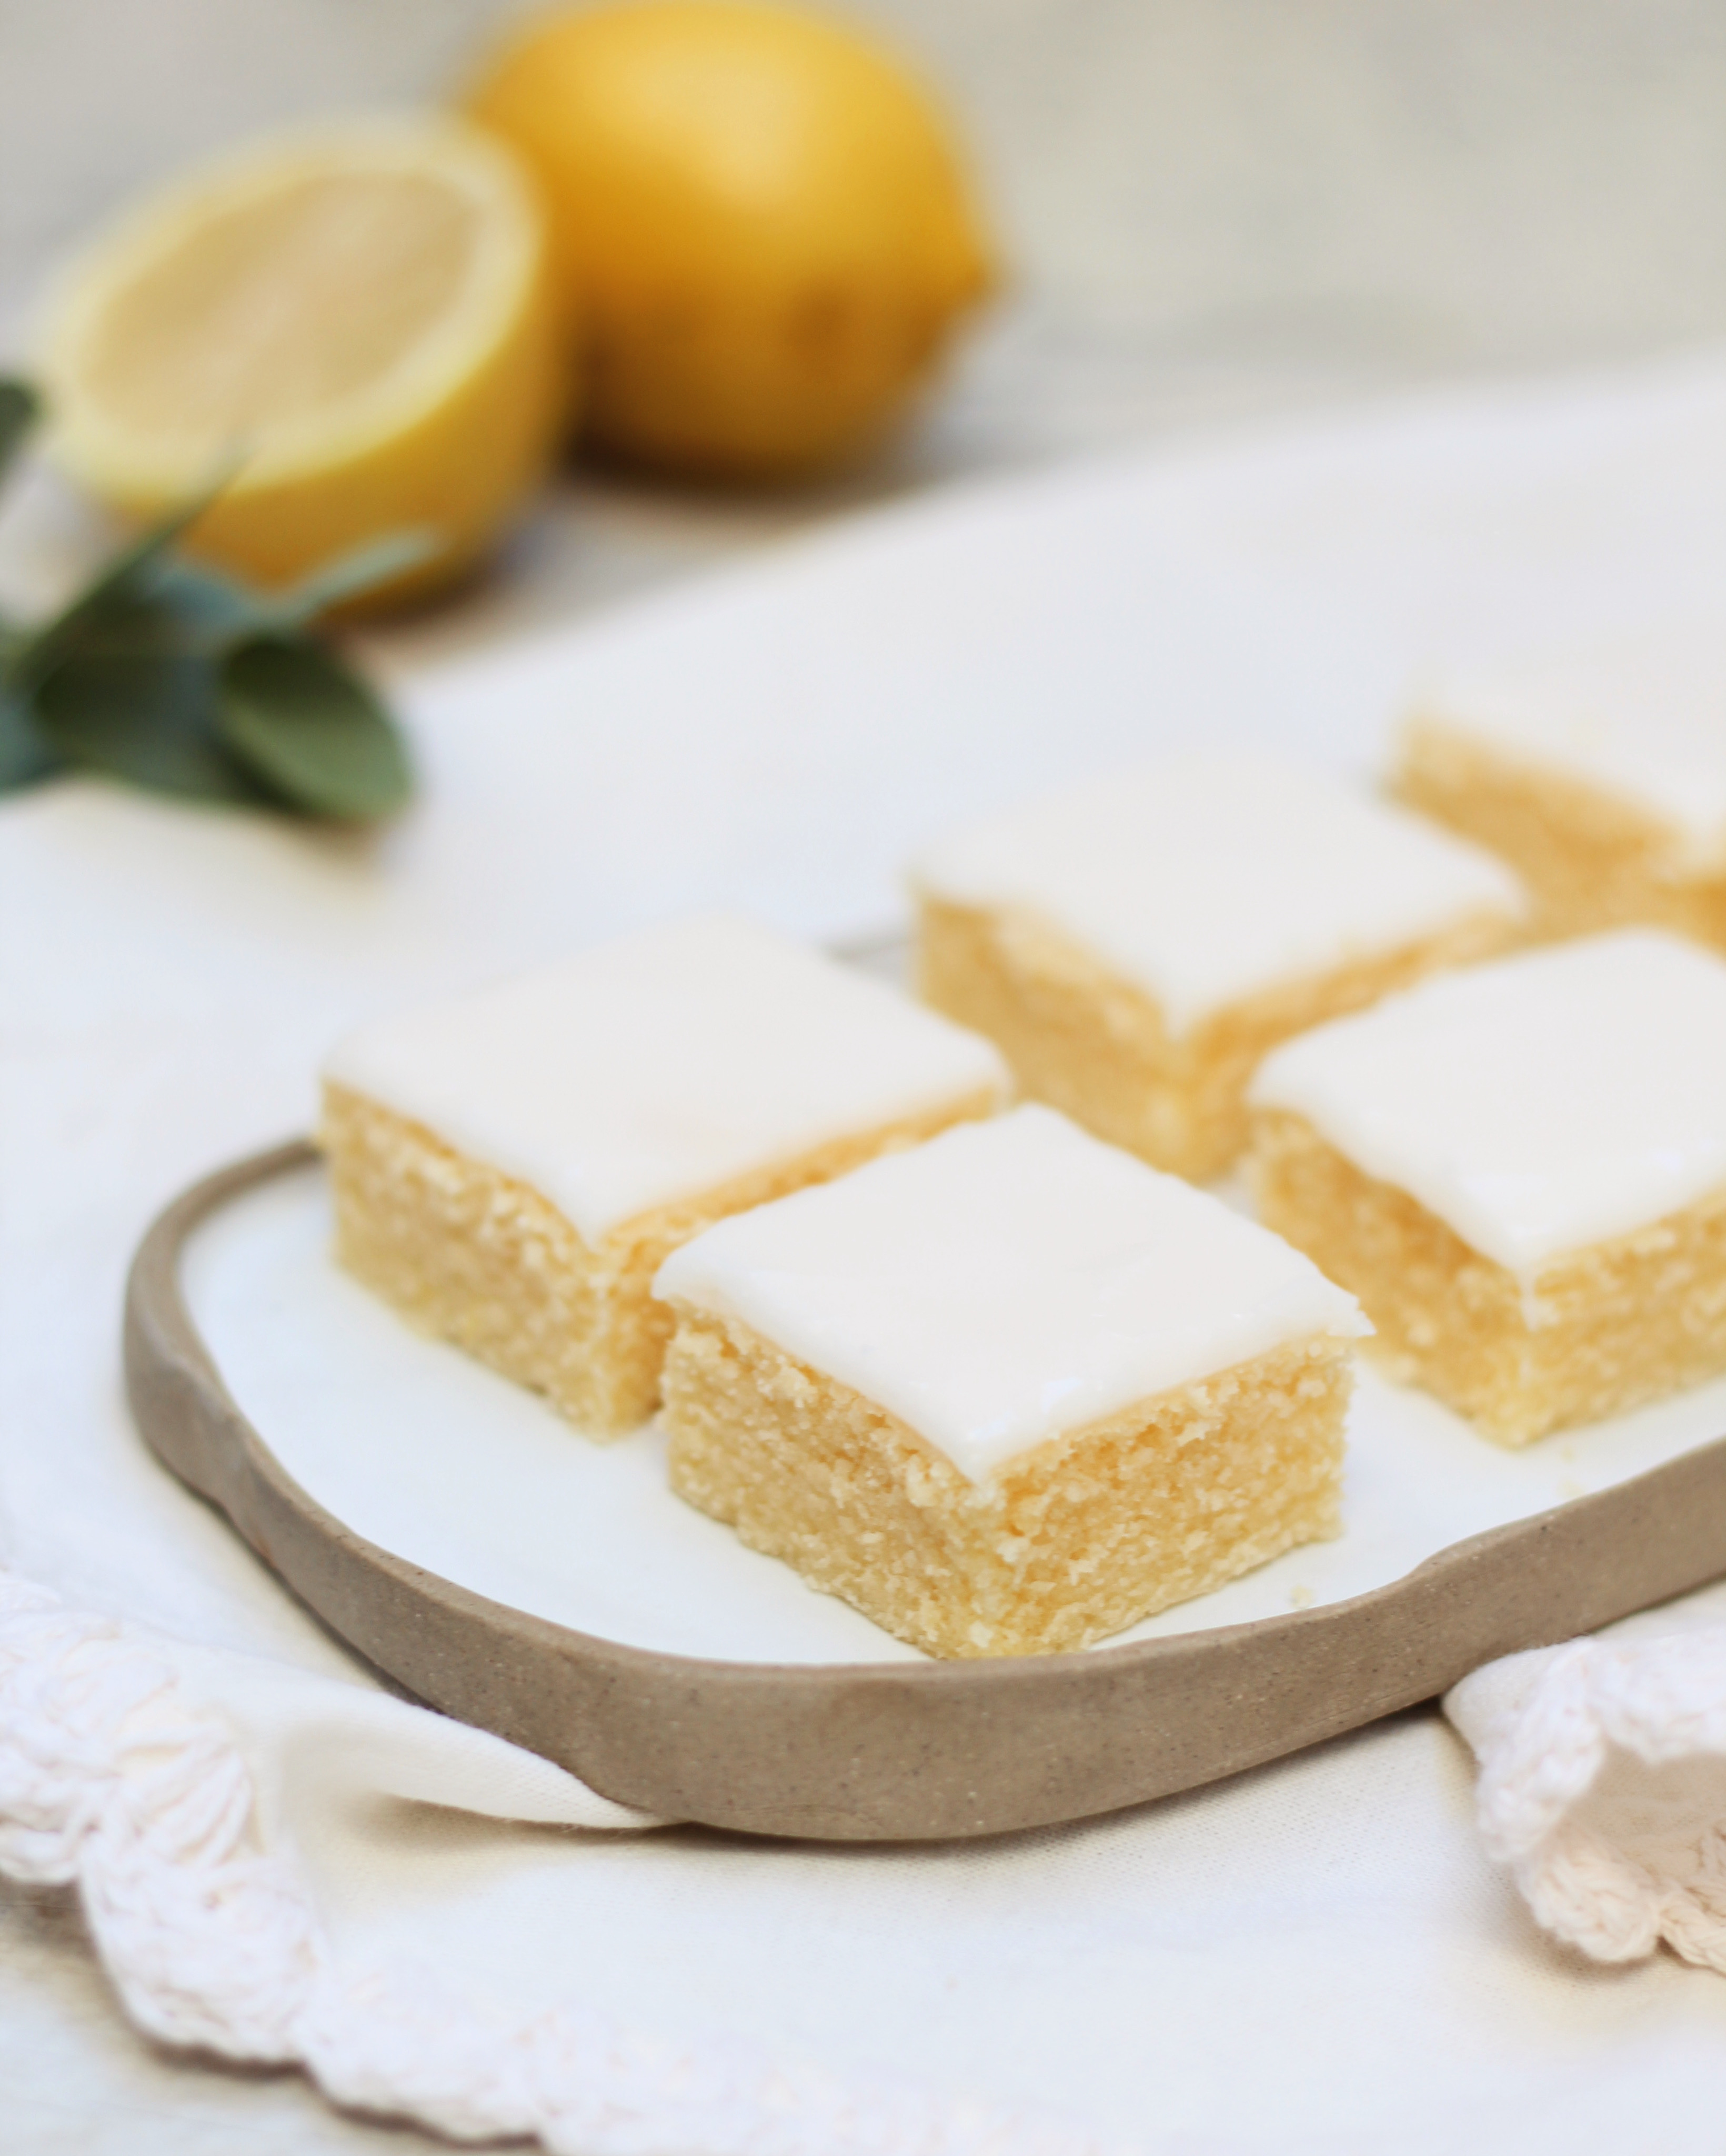 Cuadrados de limón